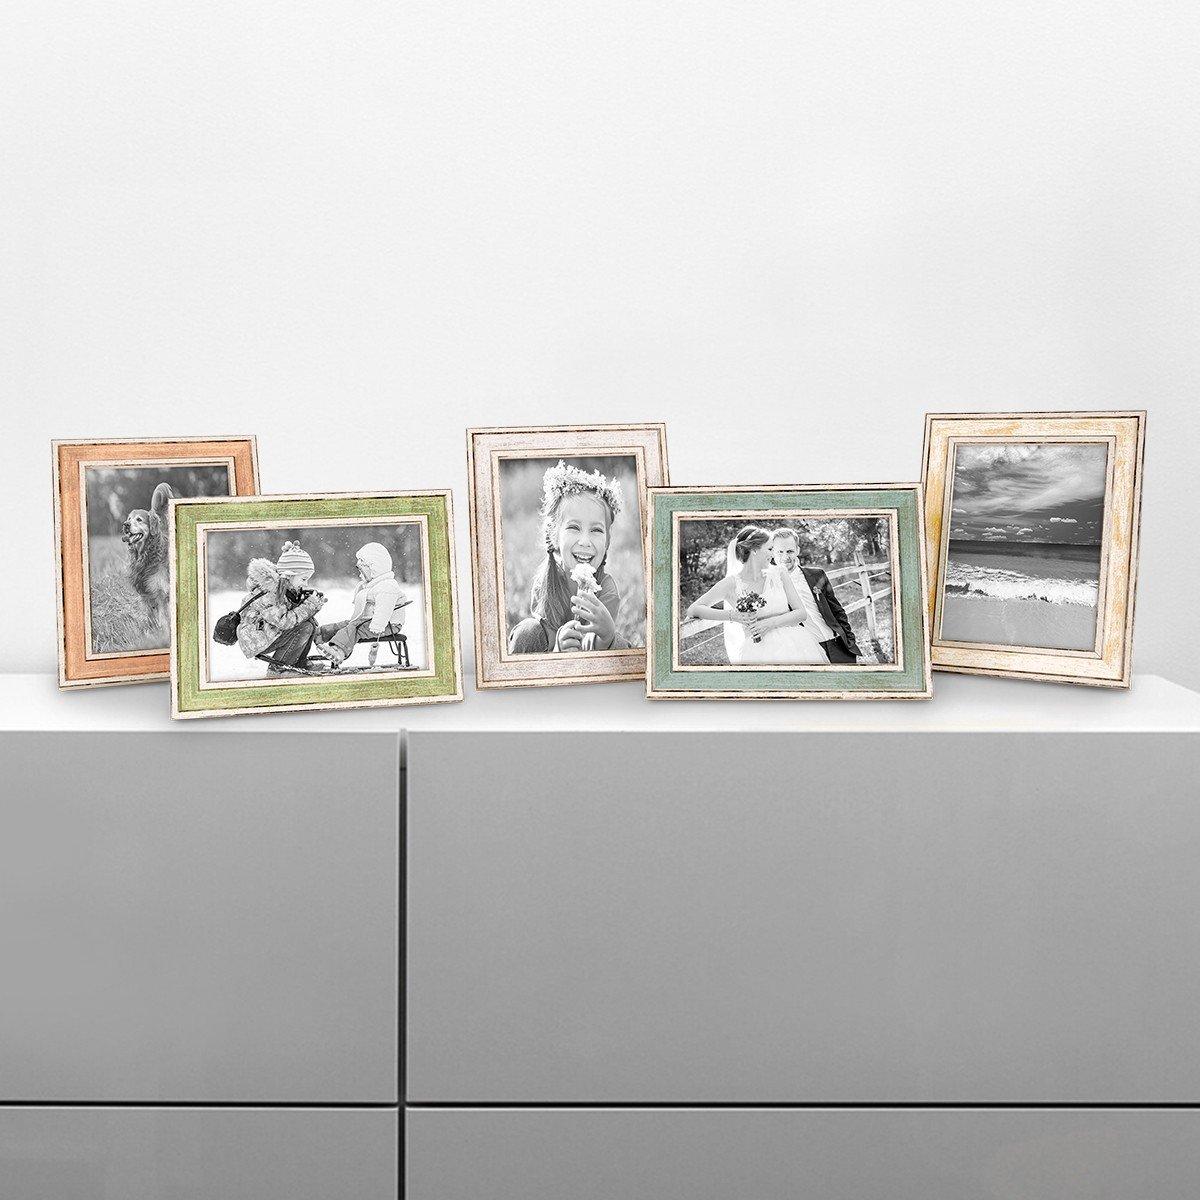 PHOTOLINI 5er Bilderrahmen-Set Pastell Alt-Weiß Hellblau Rosa Hellgrün Gold Silber 10x15 cm Massivholz mit Vintage Look Fotorahmen Wechselrahmen